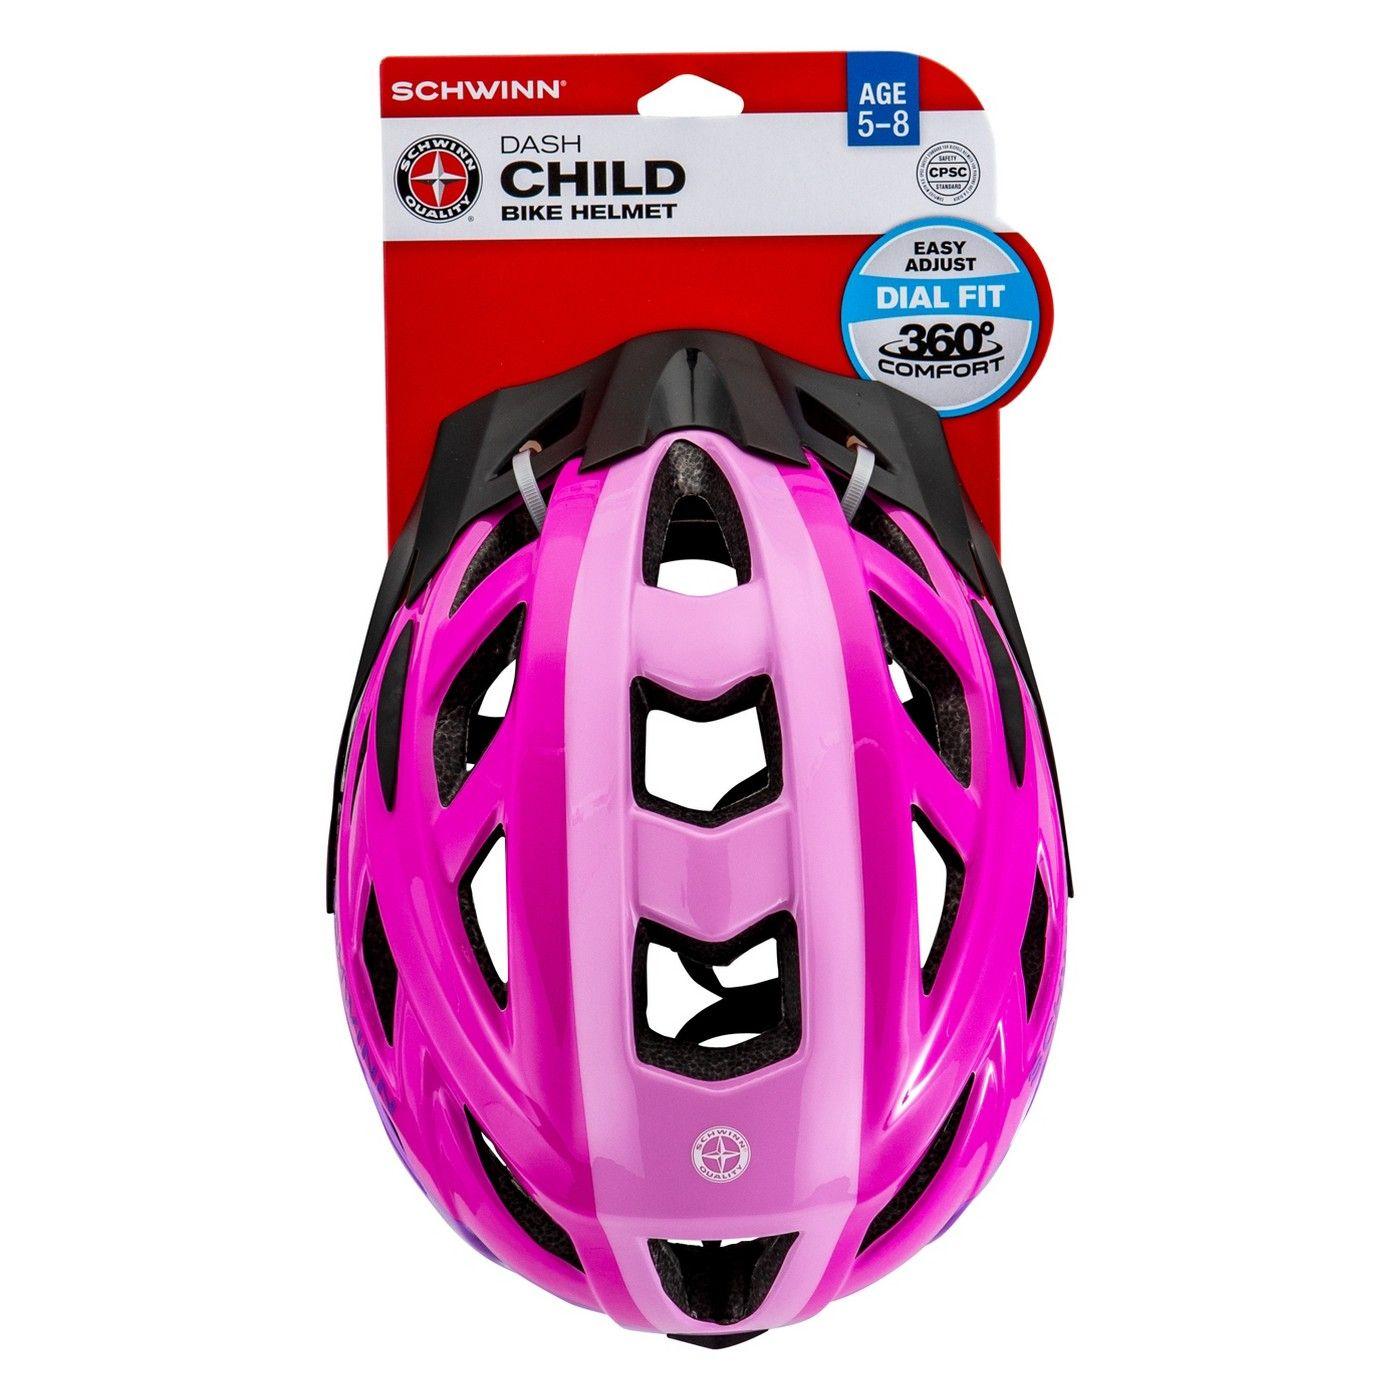 Schwinn Dash Kids Helmet S Pink Schwinn Kids Helmets Helmet